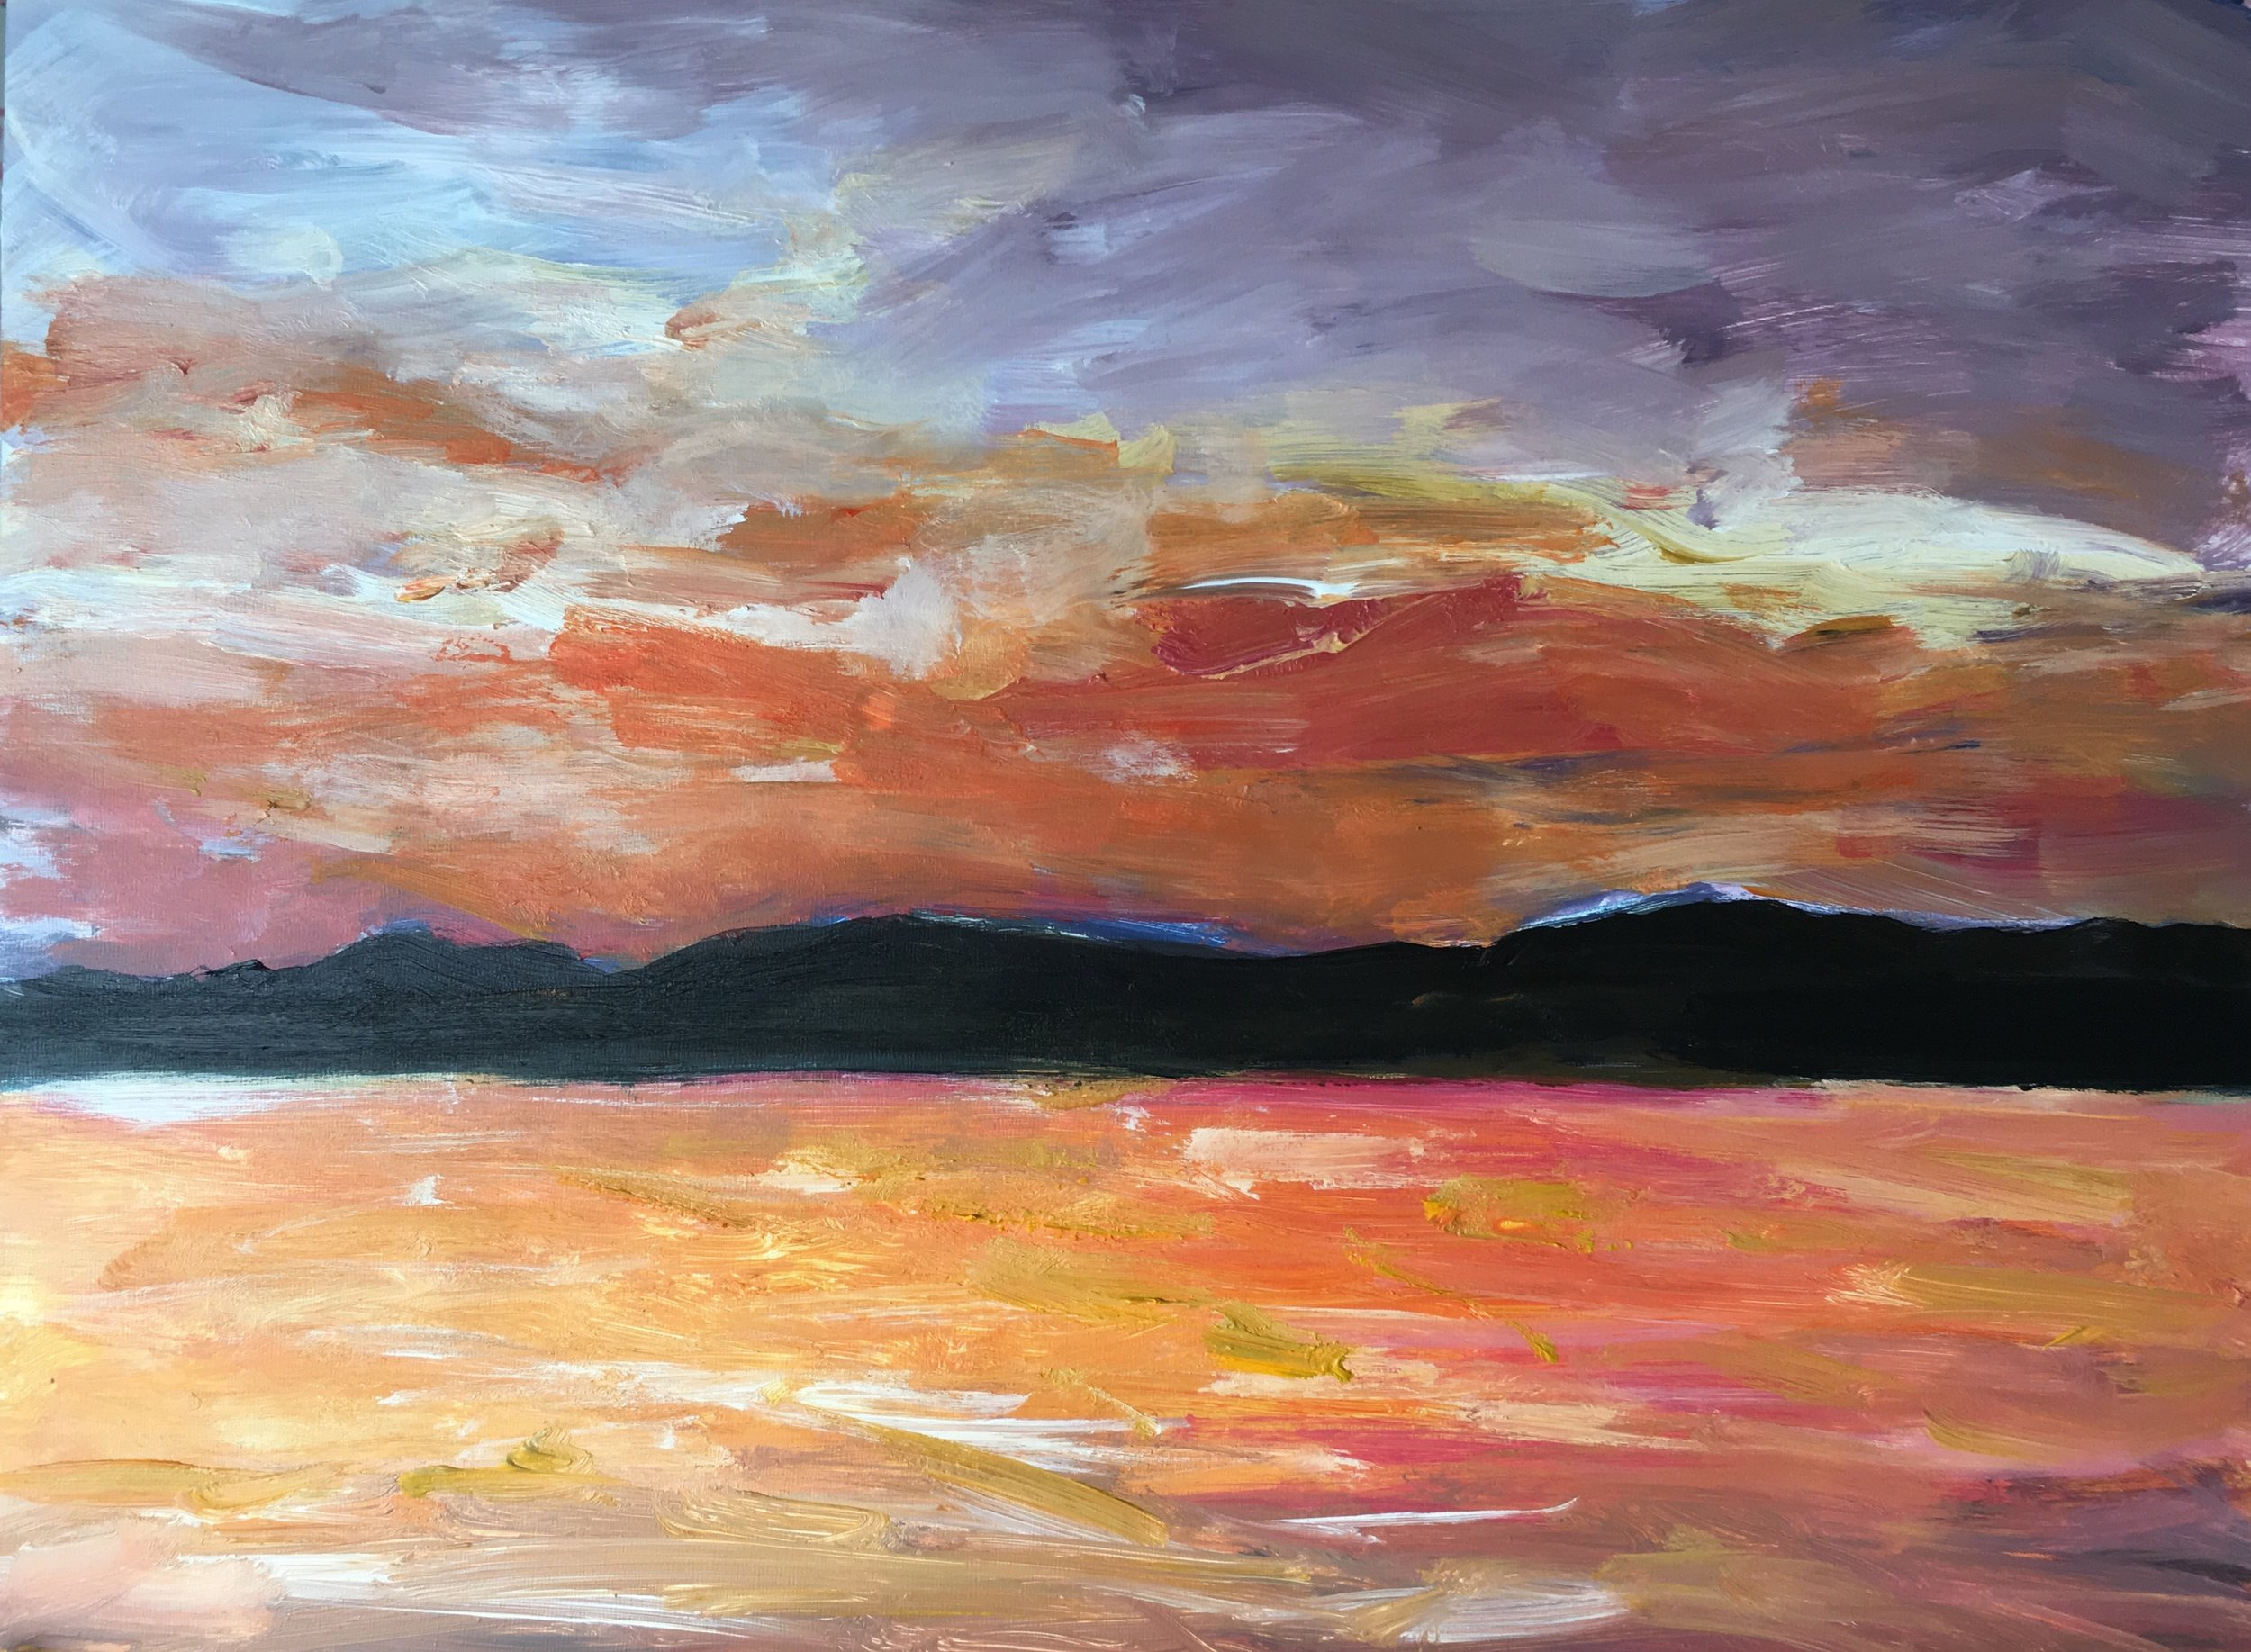 Artwork title: San Francisco Bay Ferry Sunrise Artist: Fan Lu ( Oil on canvas, 8x10  inch)